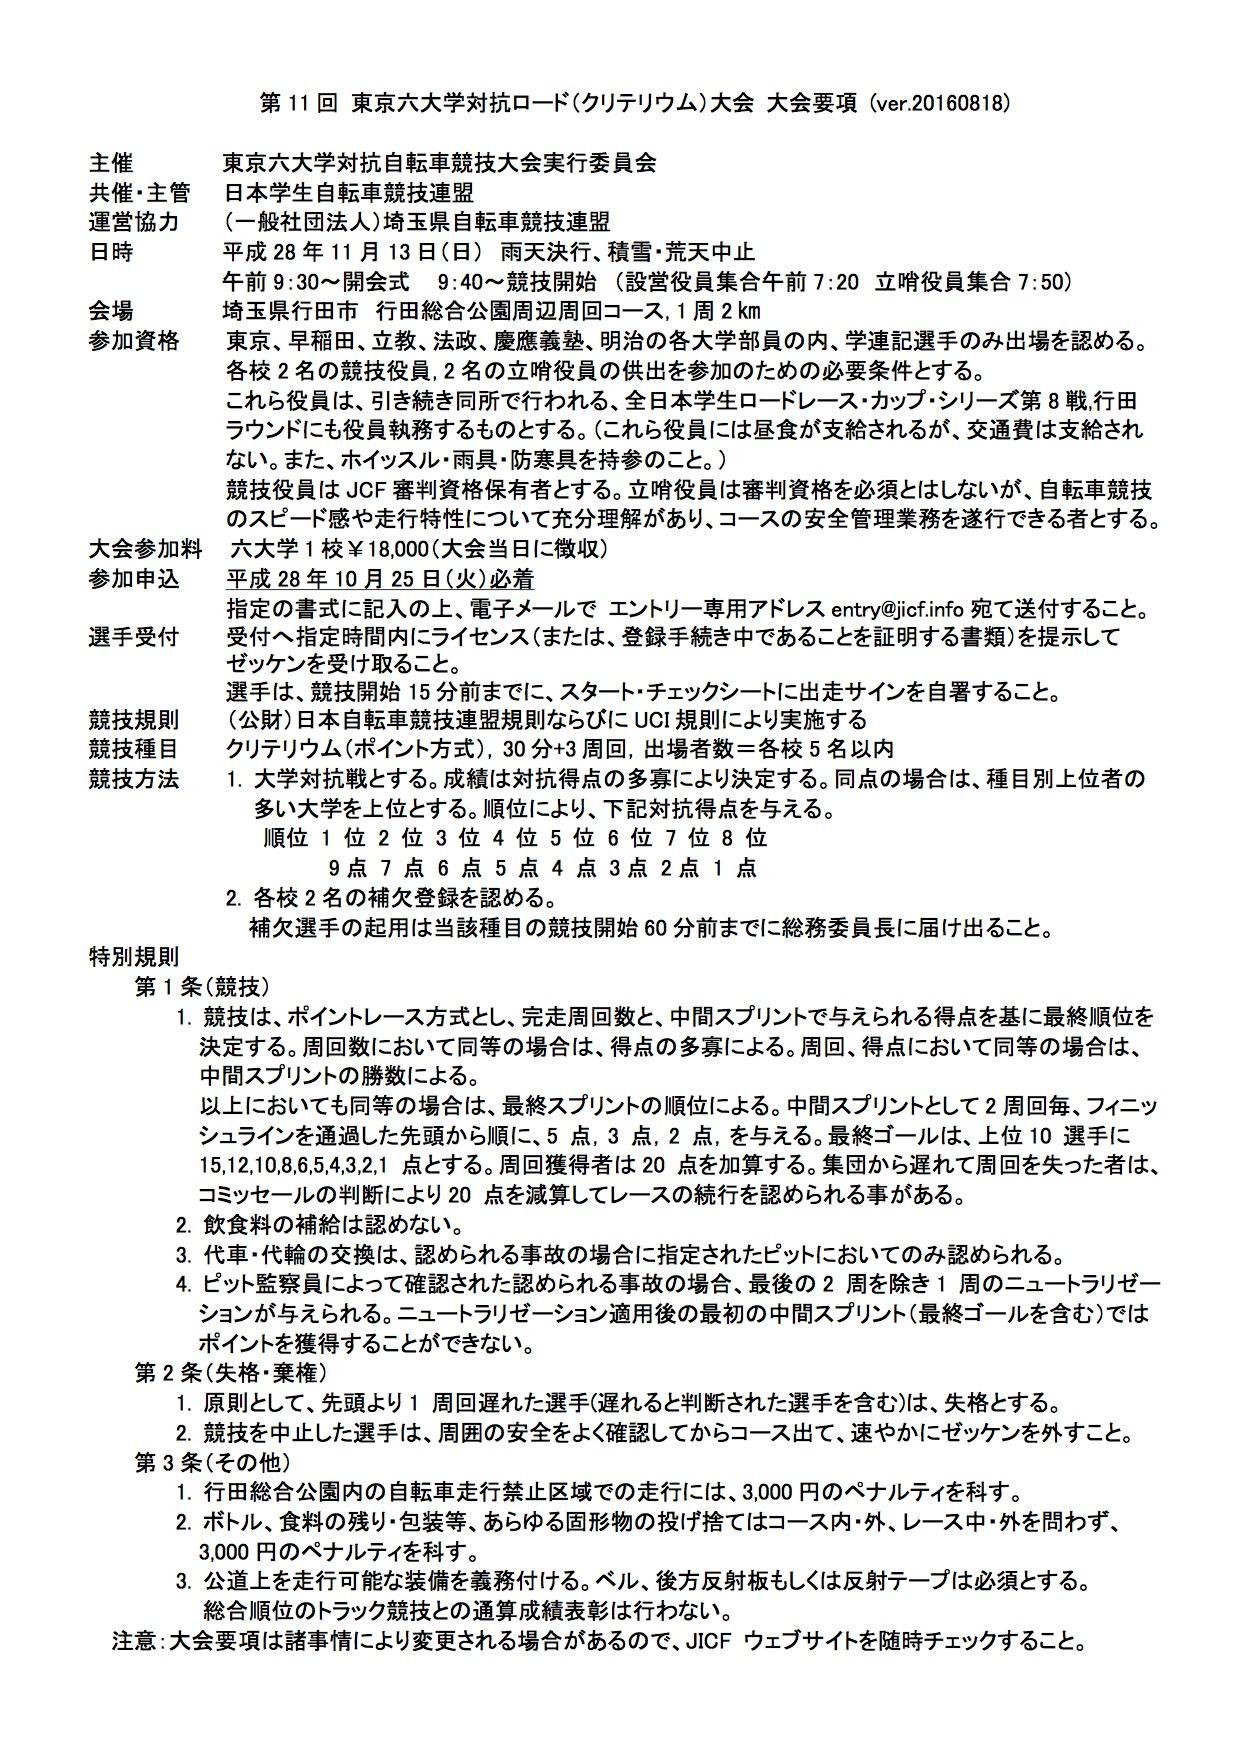 16rokudaigaku_rr_yoko_160822